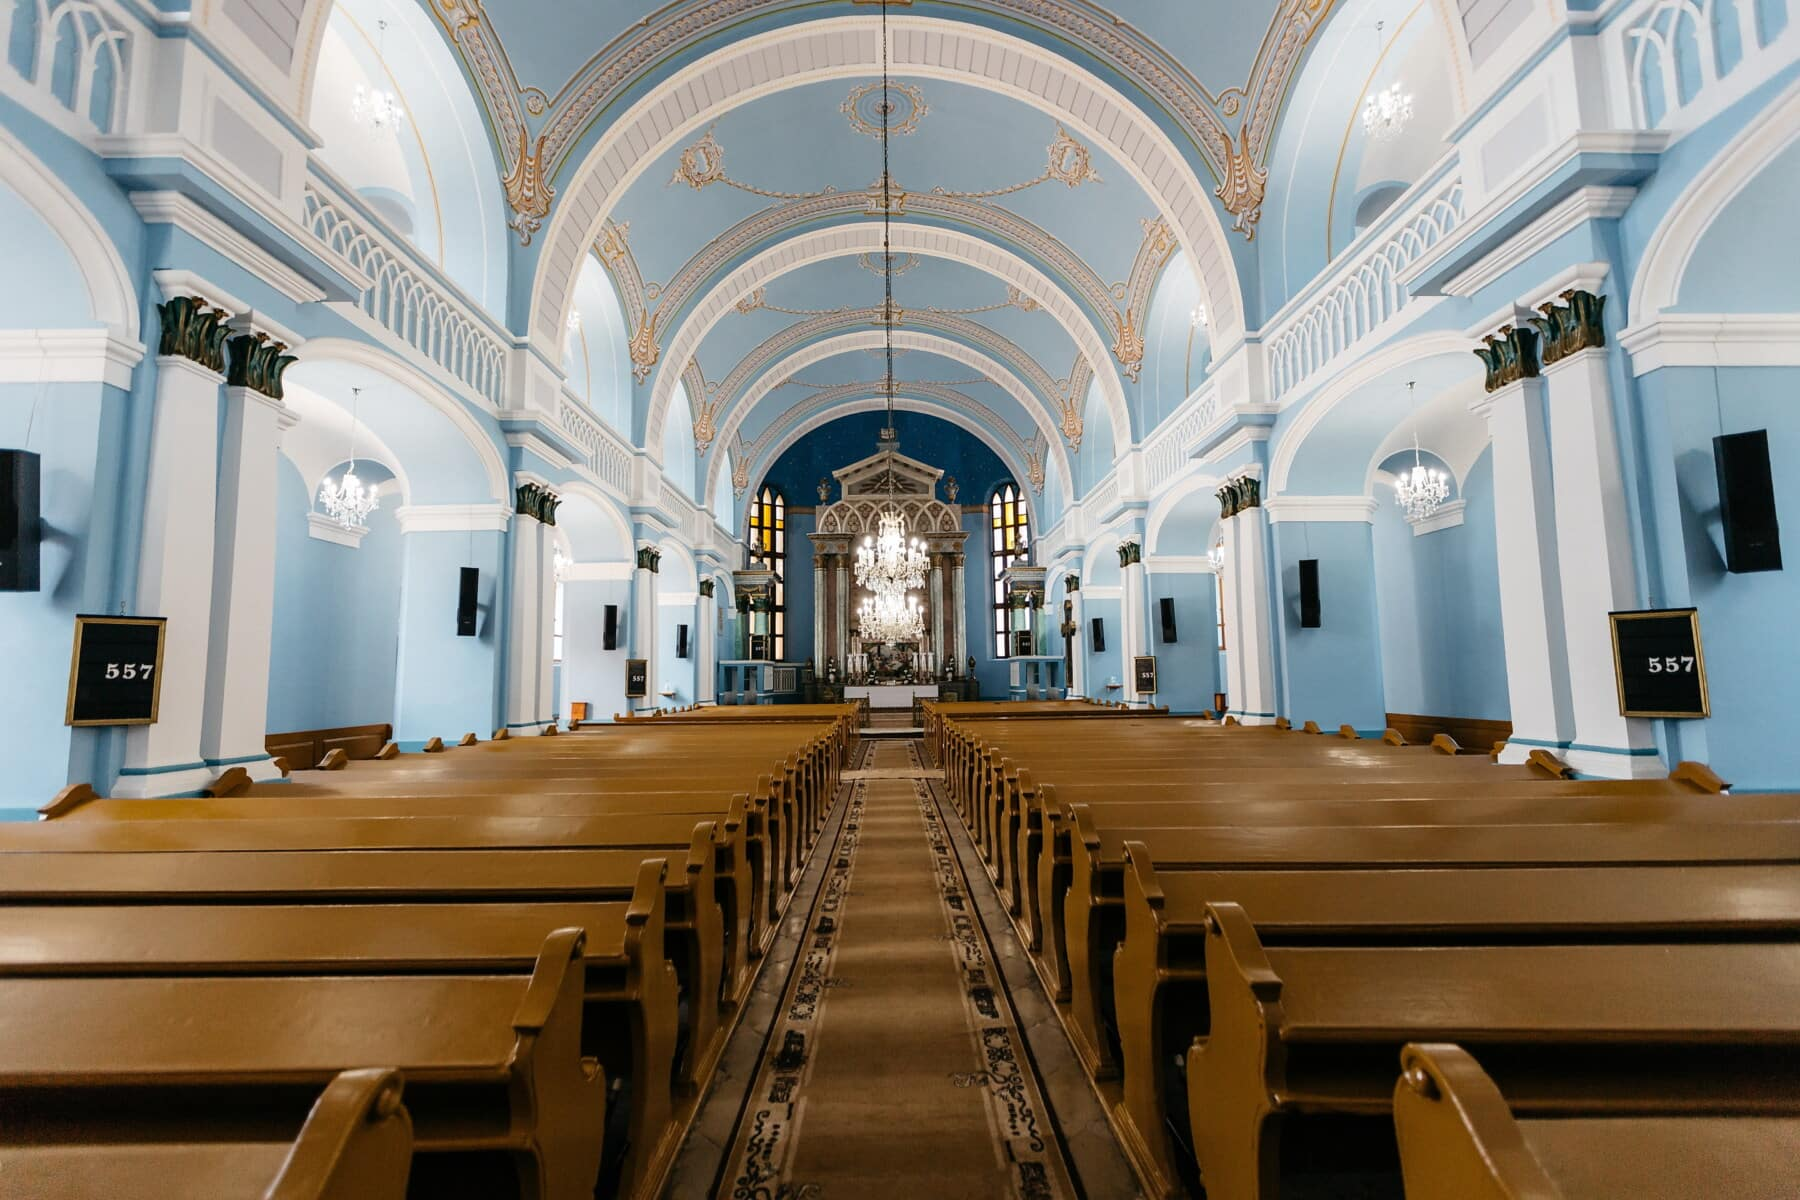 Kirche, leere, Innendekoration, Innenraum, innen, Interieur-design, drinnen, Architektur, Gebäude, Halle